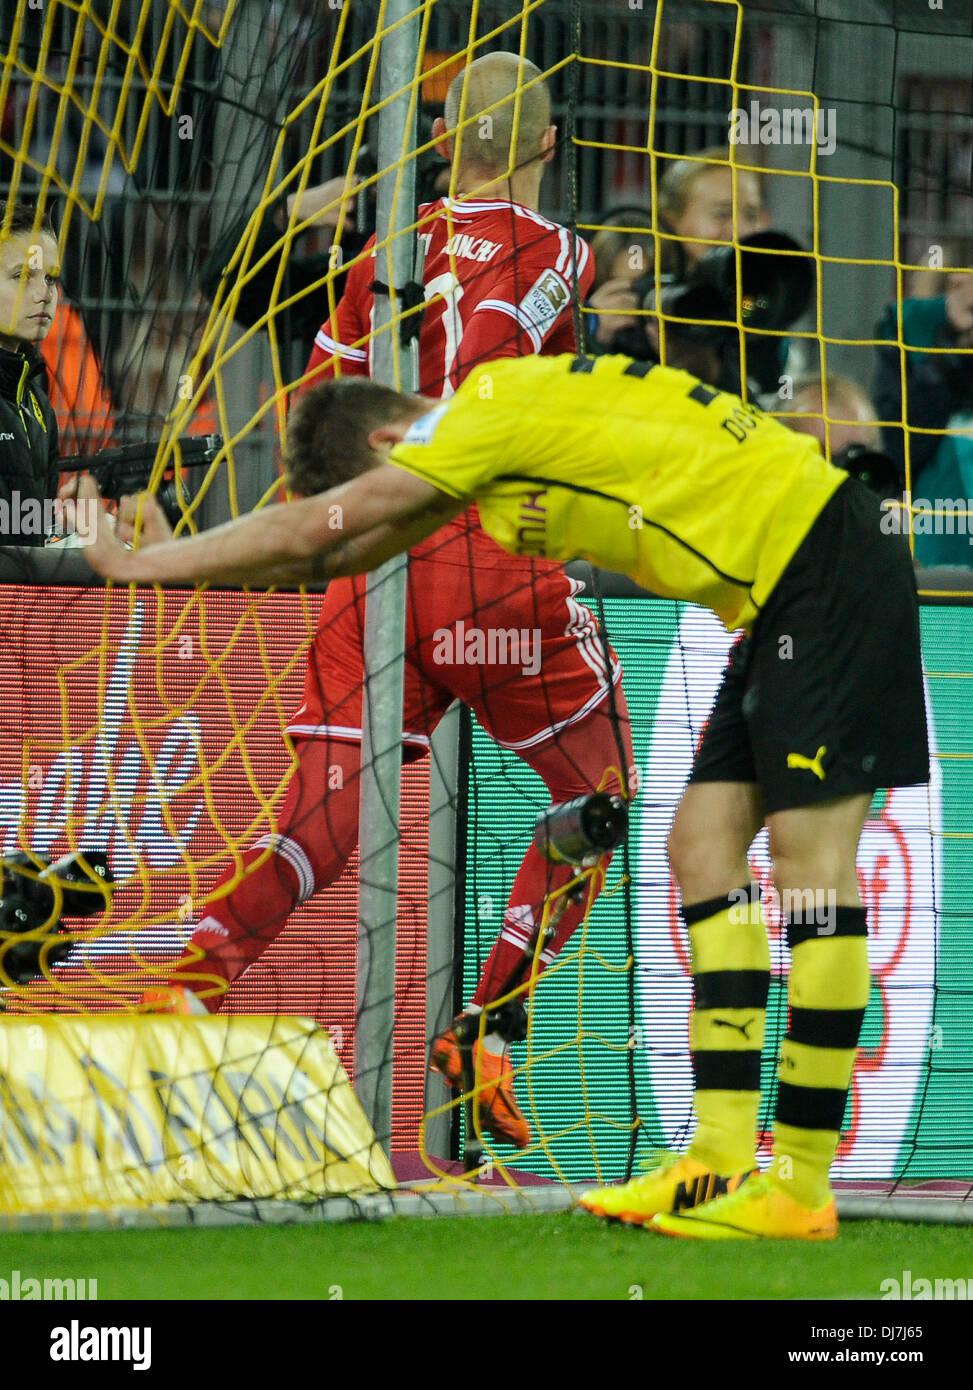 Dortmund, Germany November 23rd 2013, German Football Bundesliga Season 2013/14 matchday 13, Borussia Dortmund (BVB) vs. FC Bayern Munich (Muenchen, Munchen, FCB) 3:0 --- Eric Durm (BVB) frutrated, Arjen Robben (FCB) celebrates his goal - Stock Image